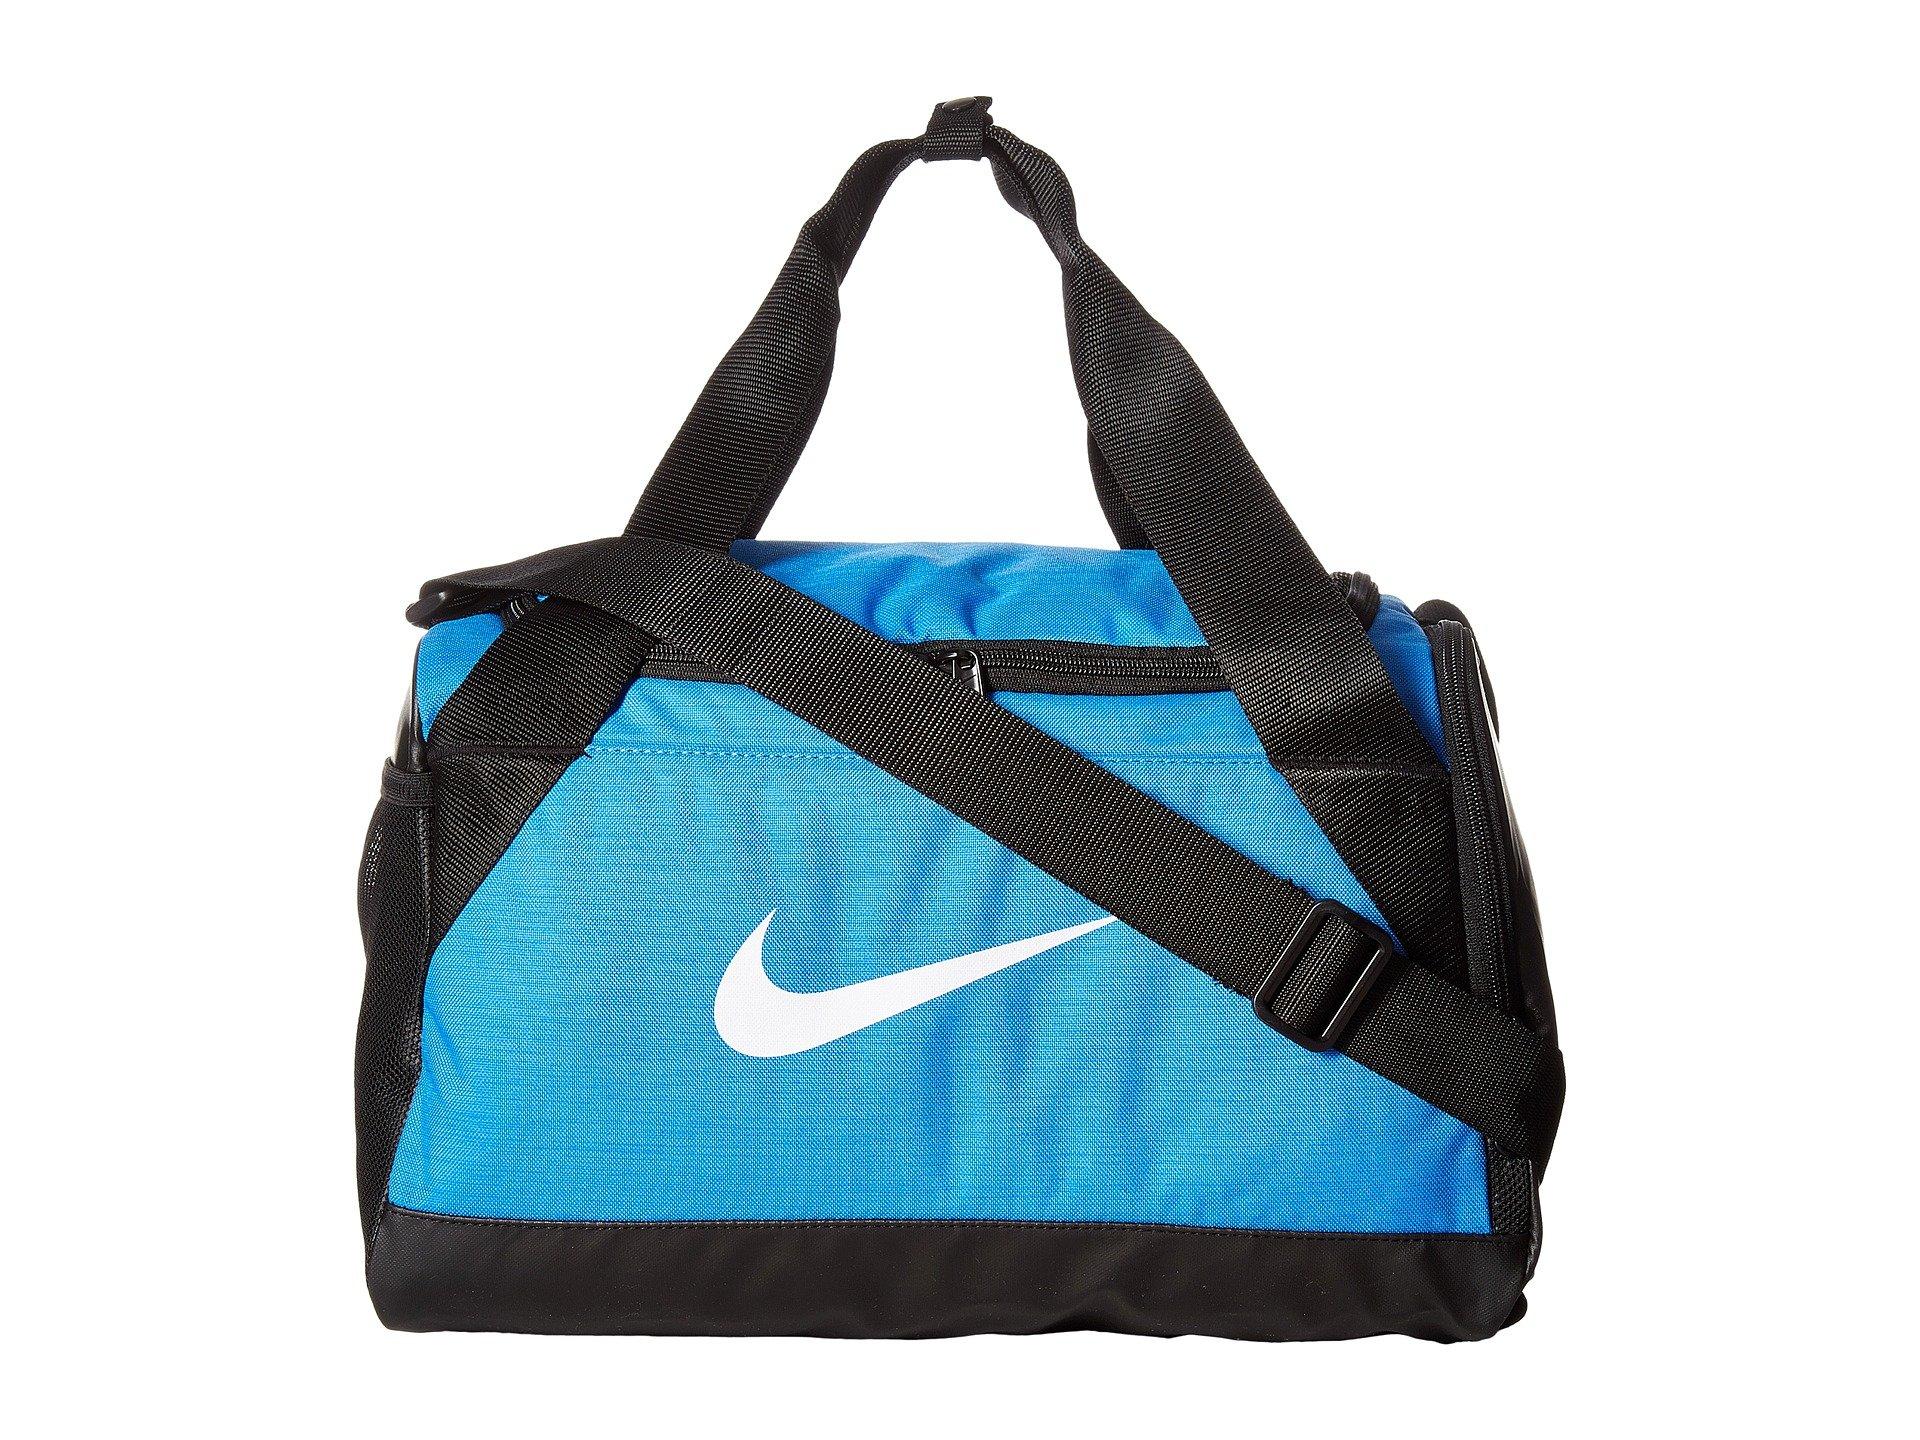 Nike Brasilia Duffel Extra Small In Light Photo Blue Black White ... 4351883a81fff